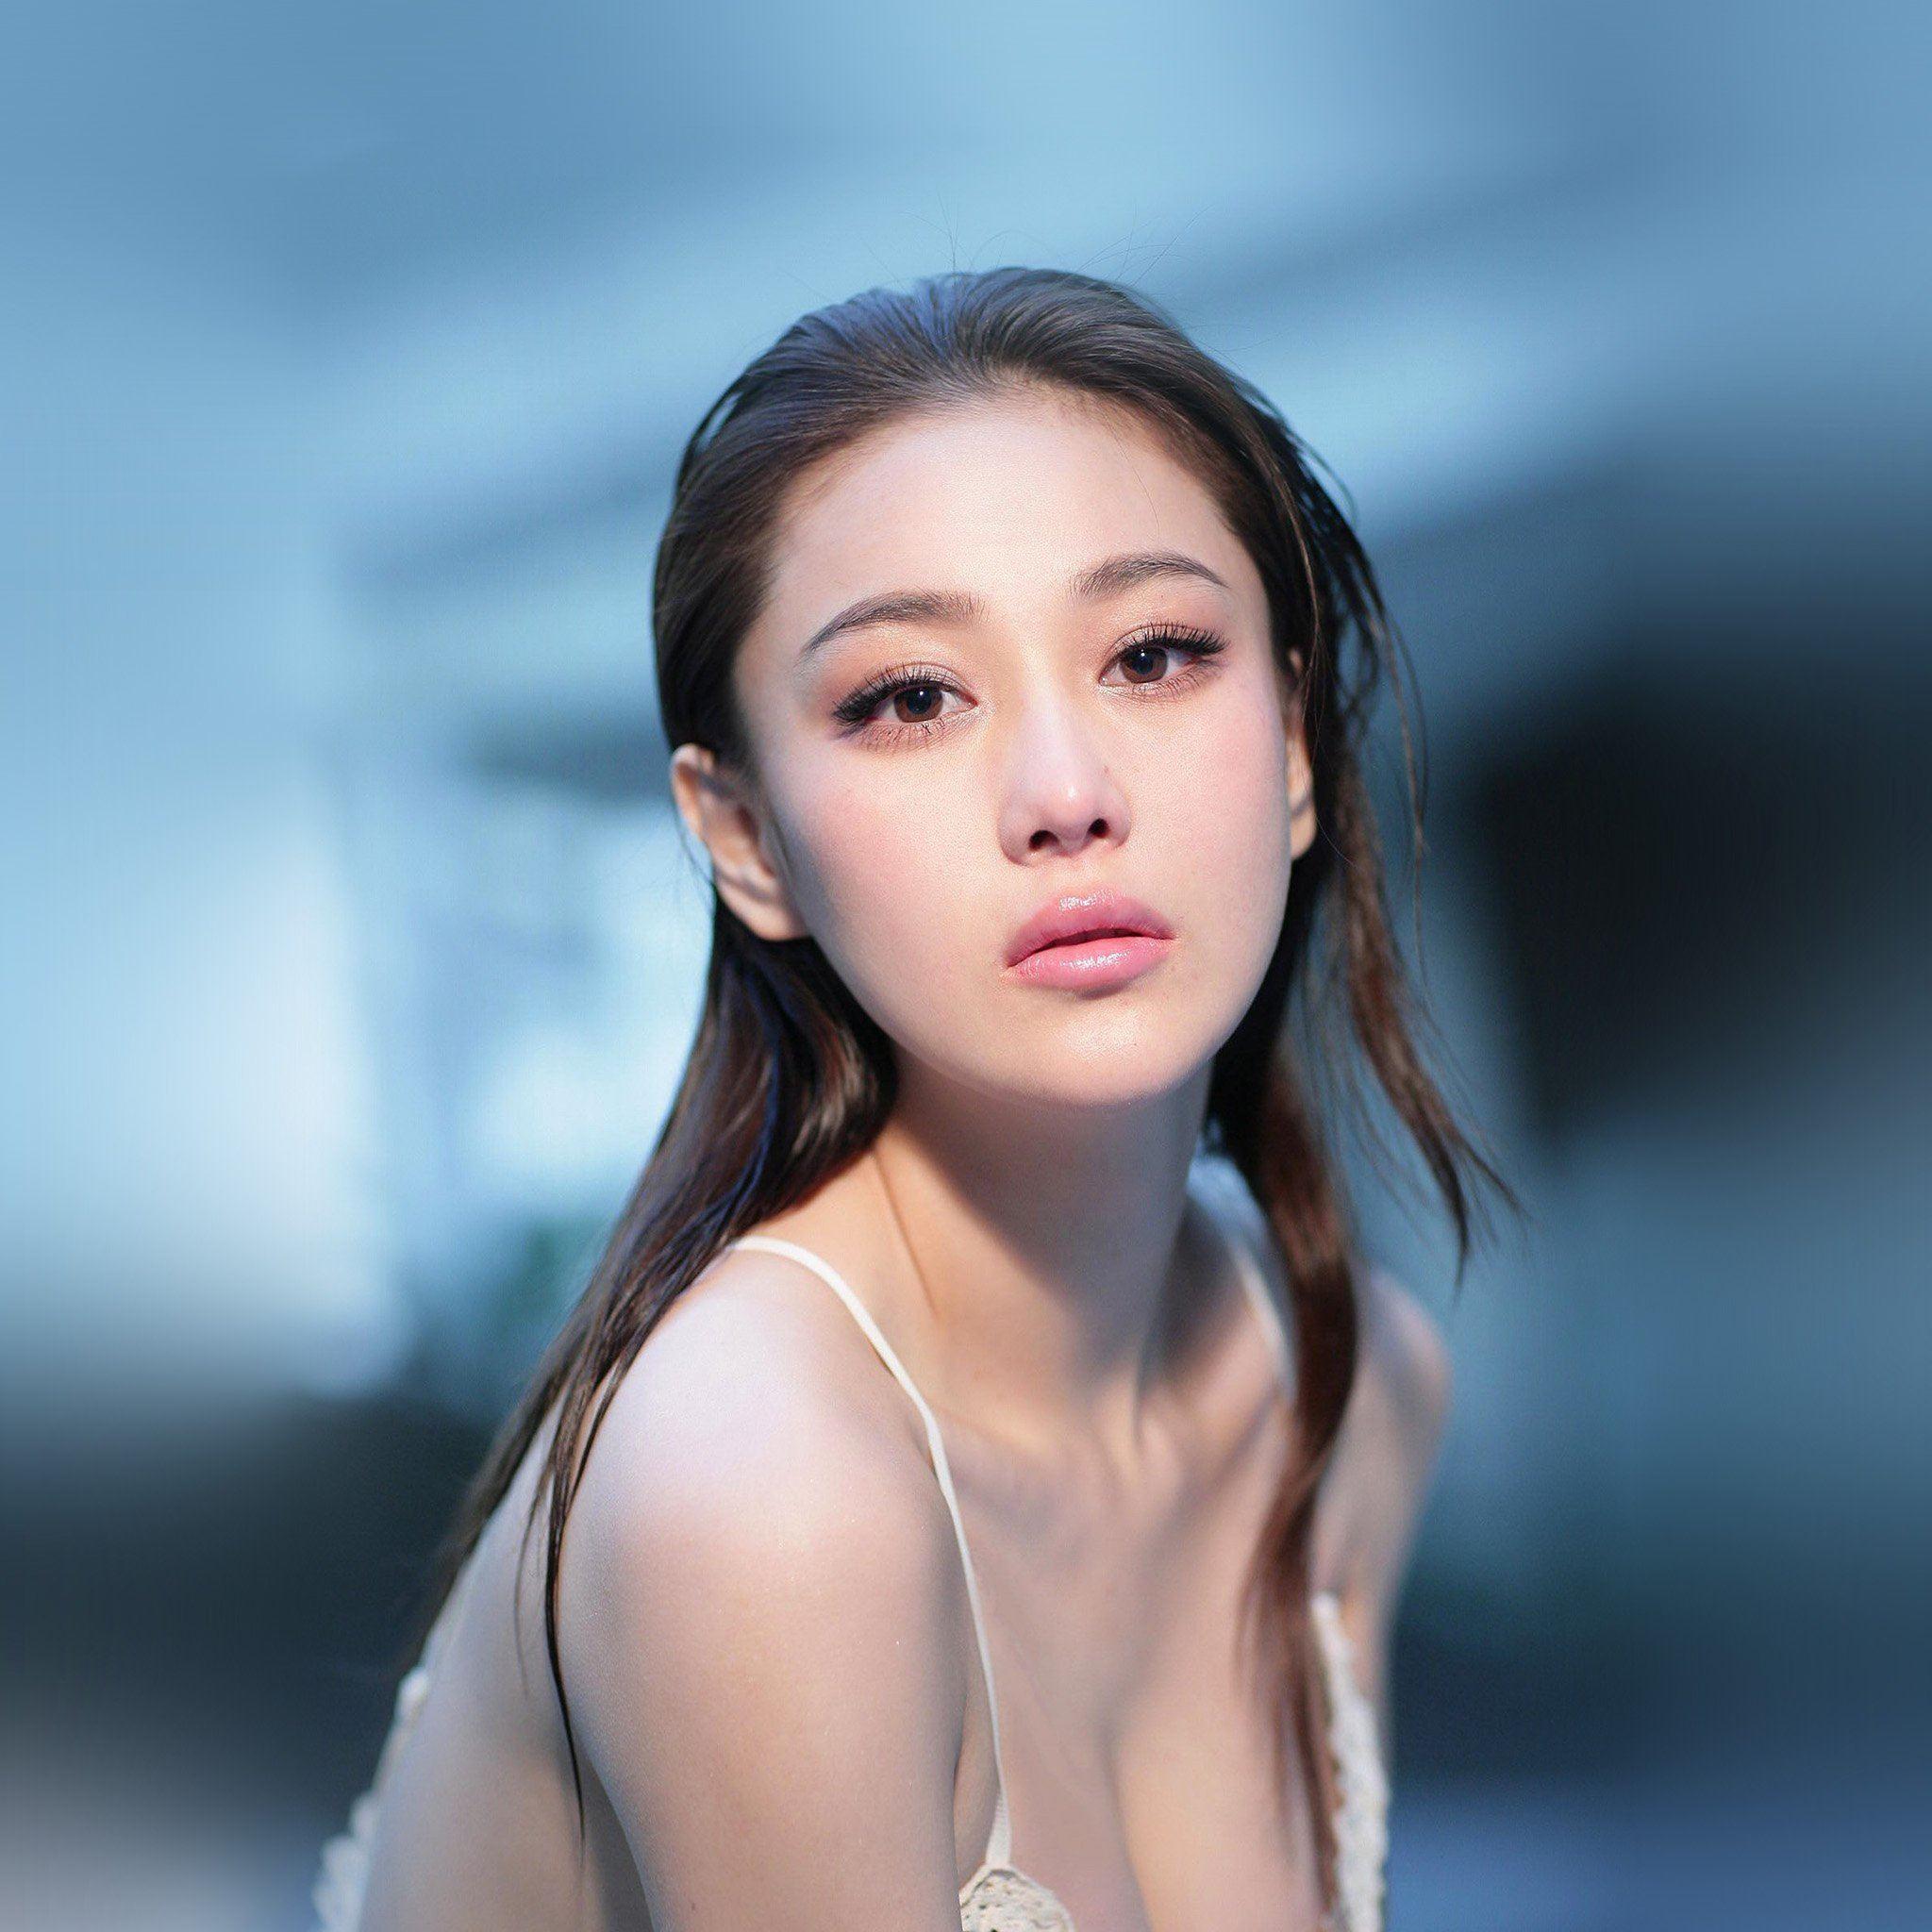 Chinese Girl Hot Model Star IPad Air Wallpaper